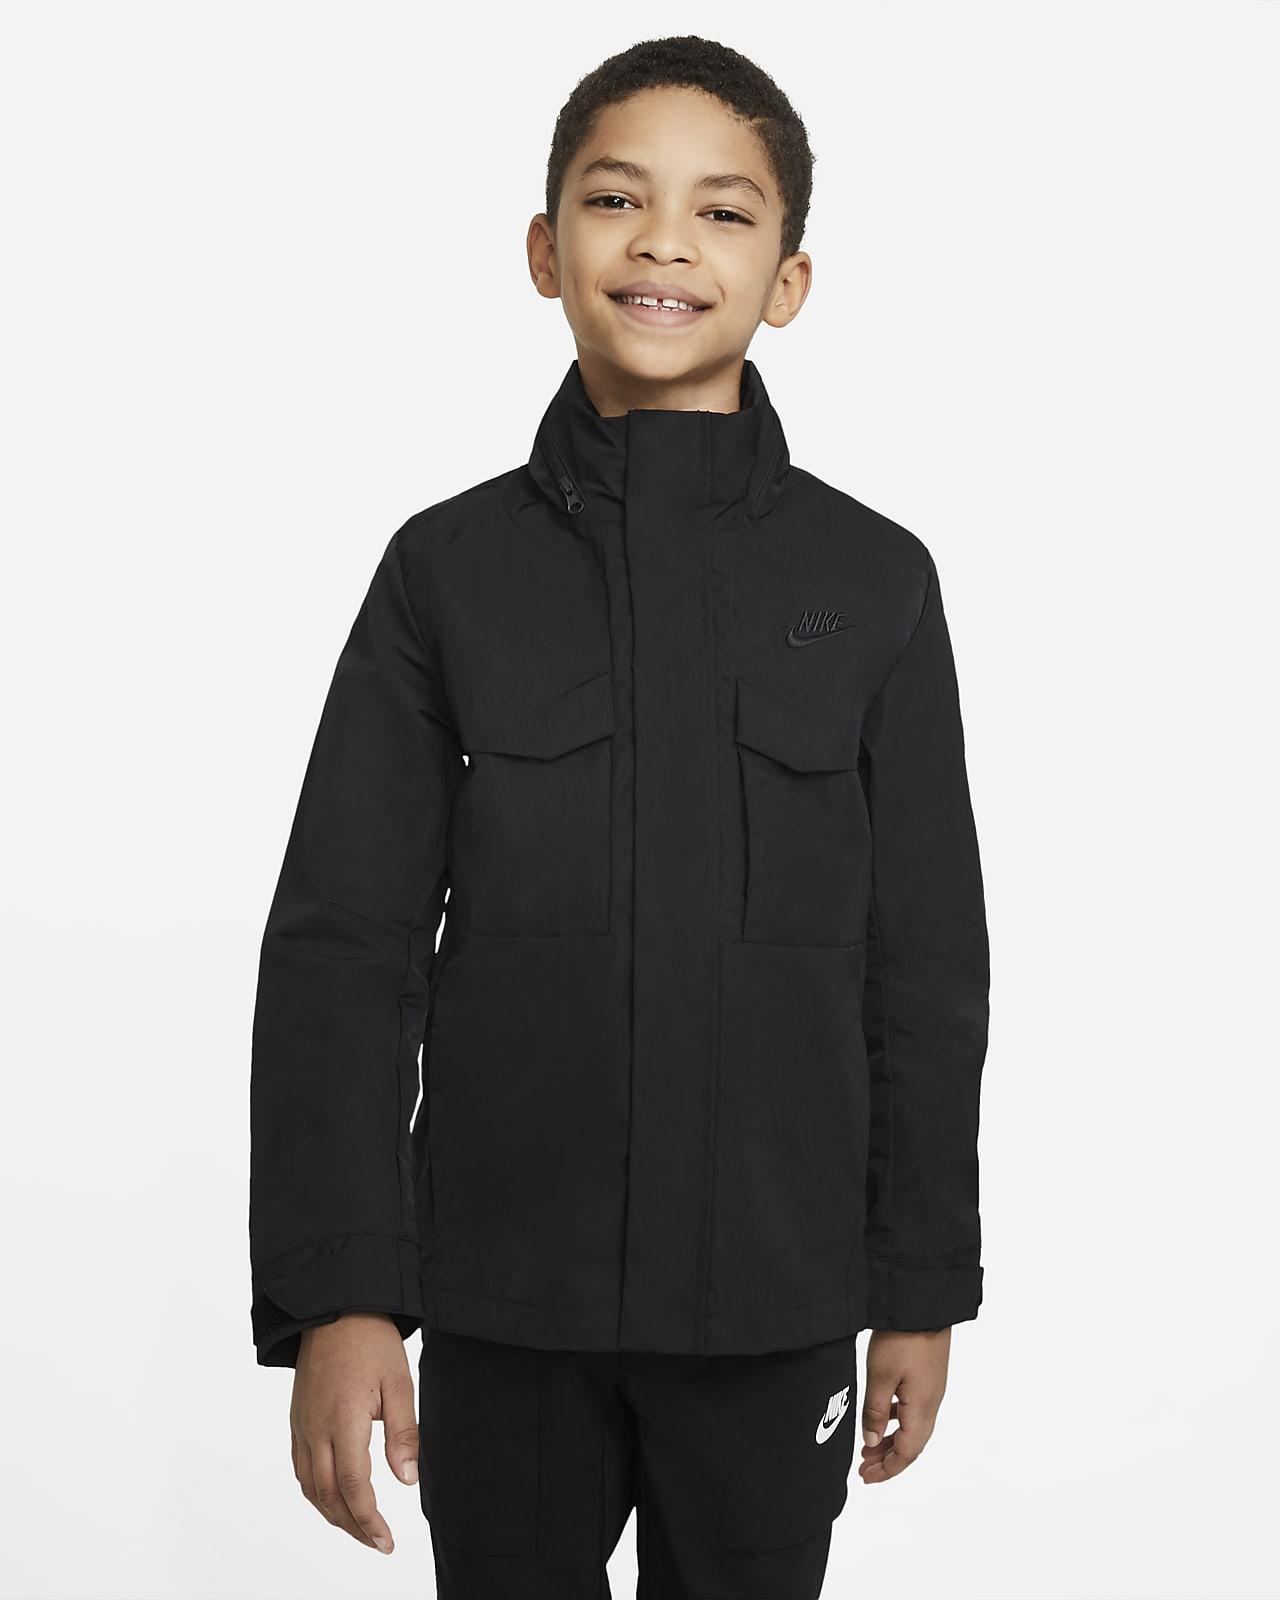 Nike Sportswear M65 Field-Jacket für ältere Kinder (Jungen)